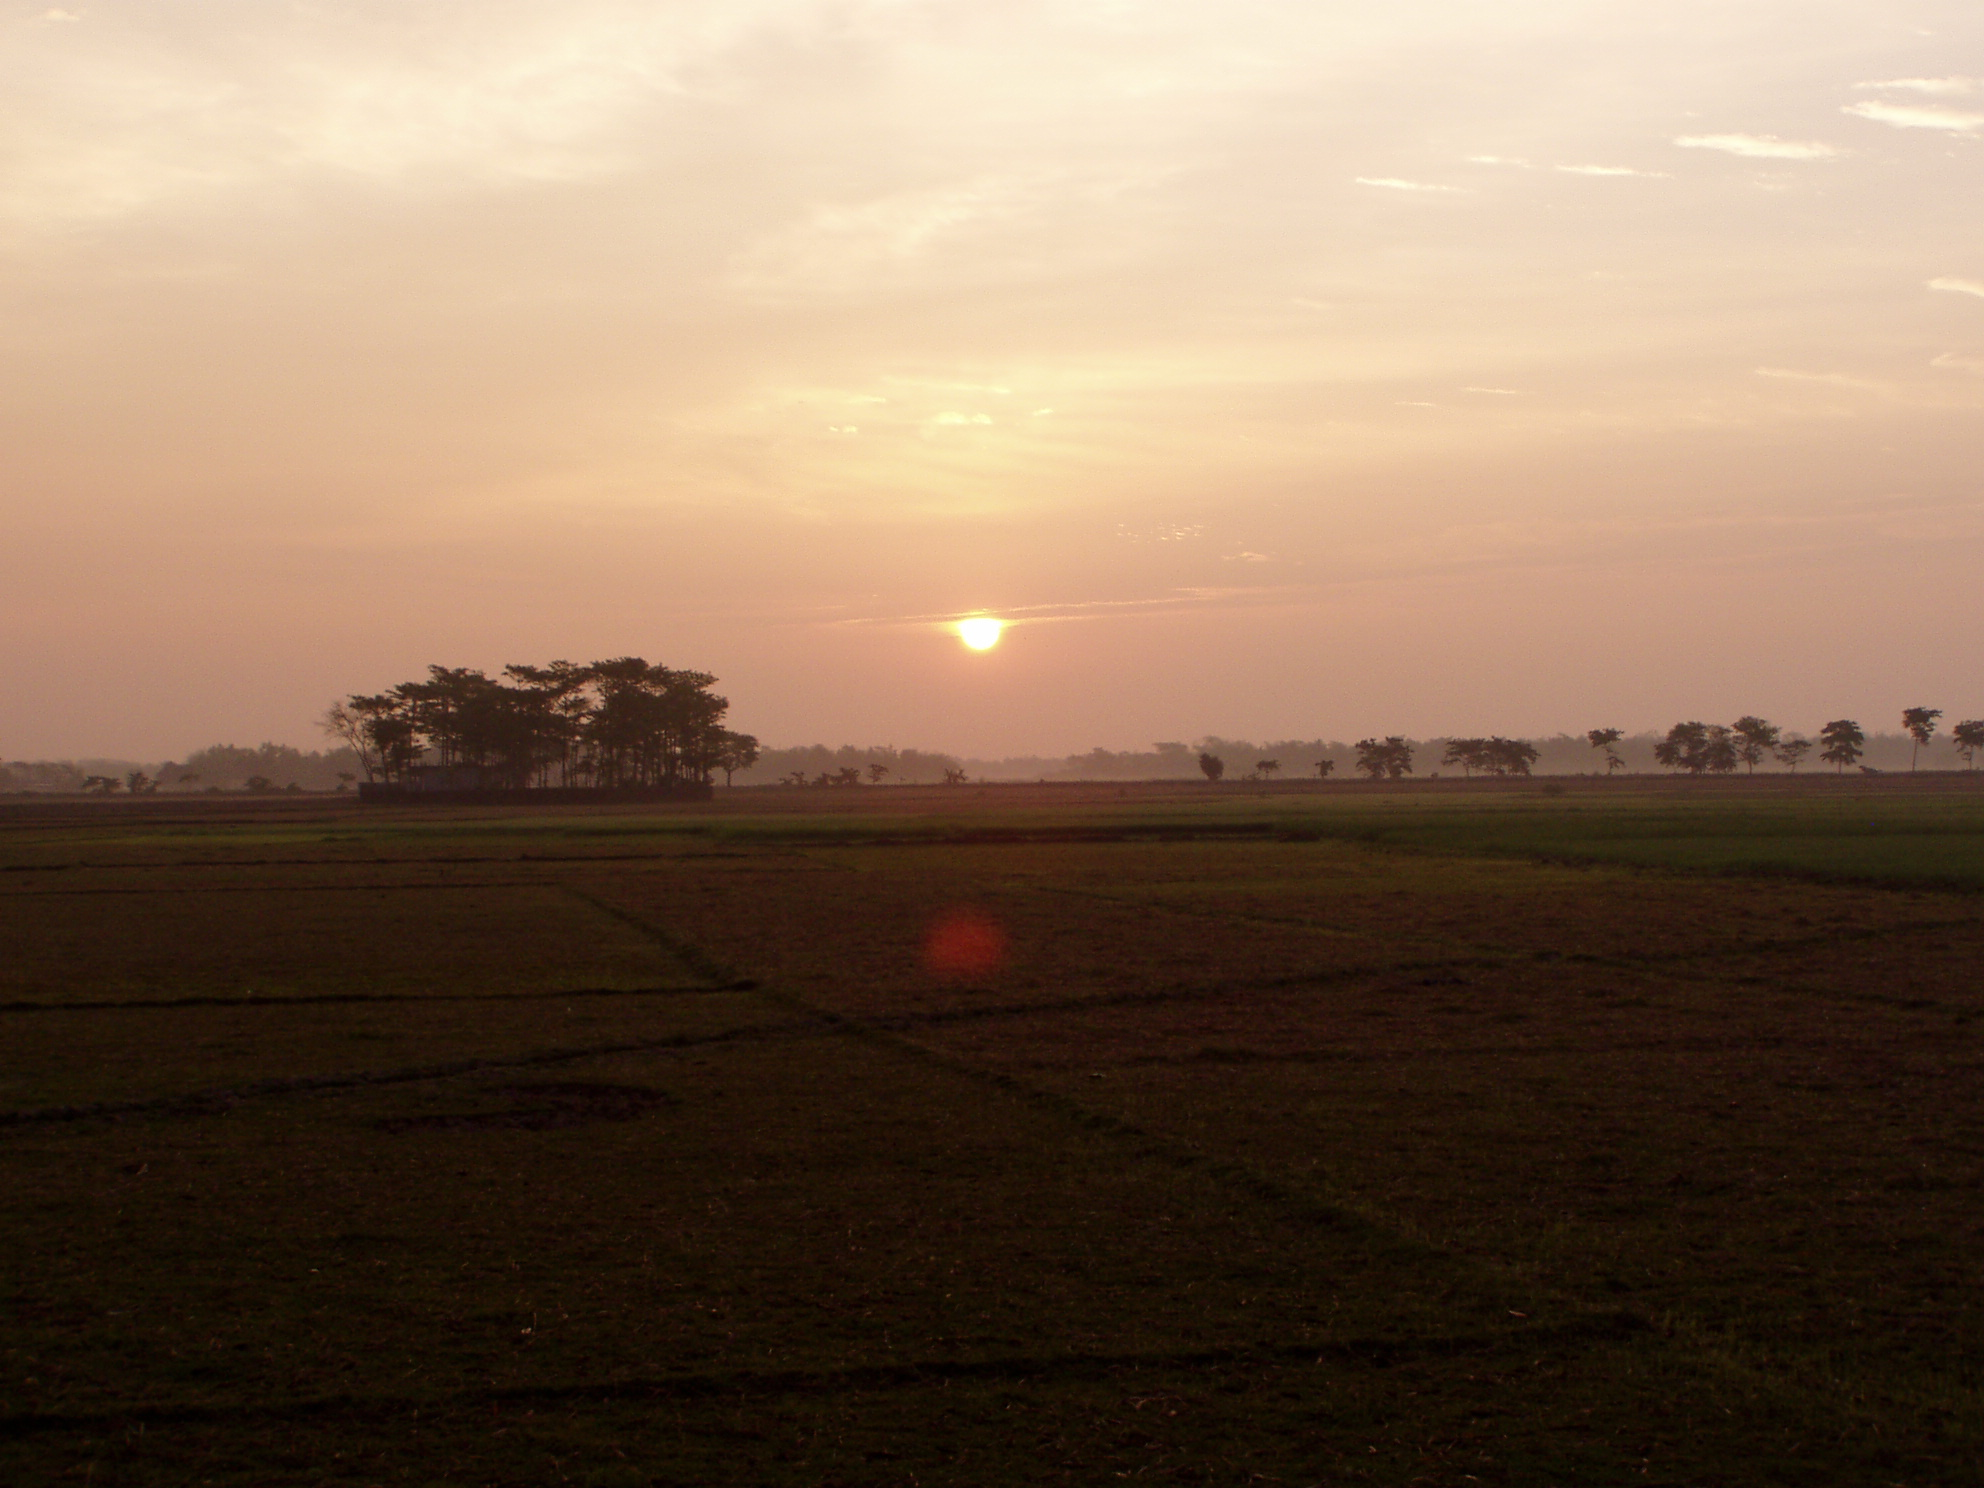 Bangladesh : sun rise and trees